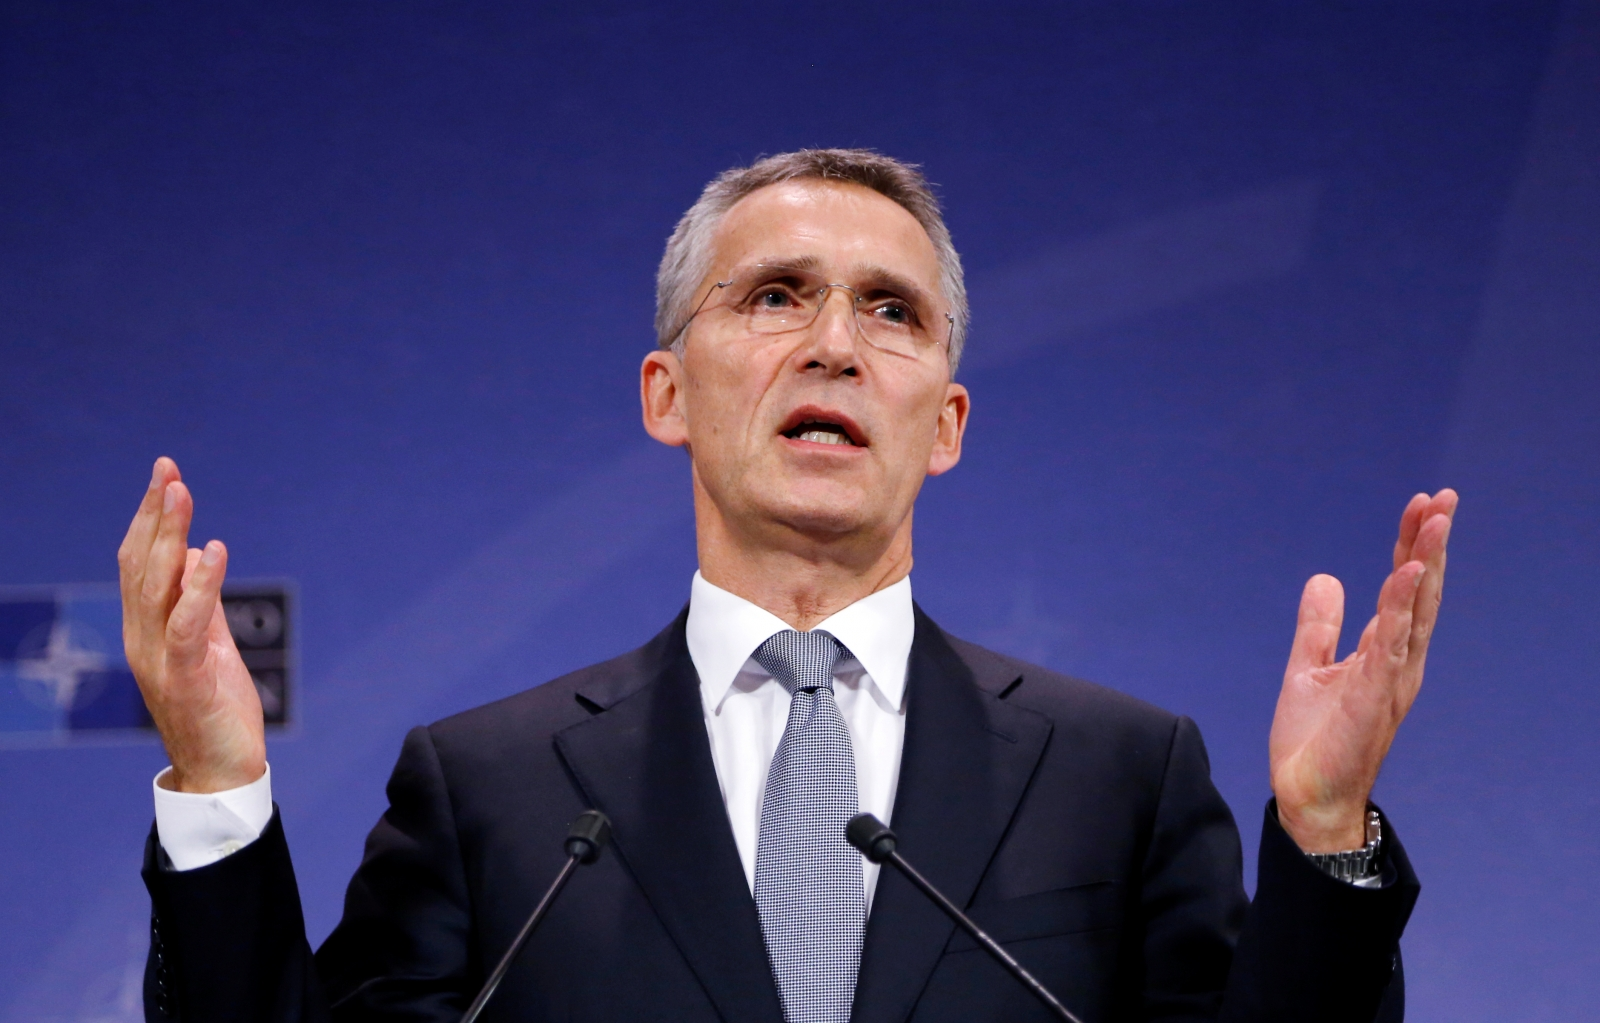 NATO Secretary-General Stoltenberg